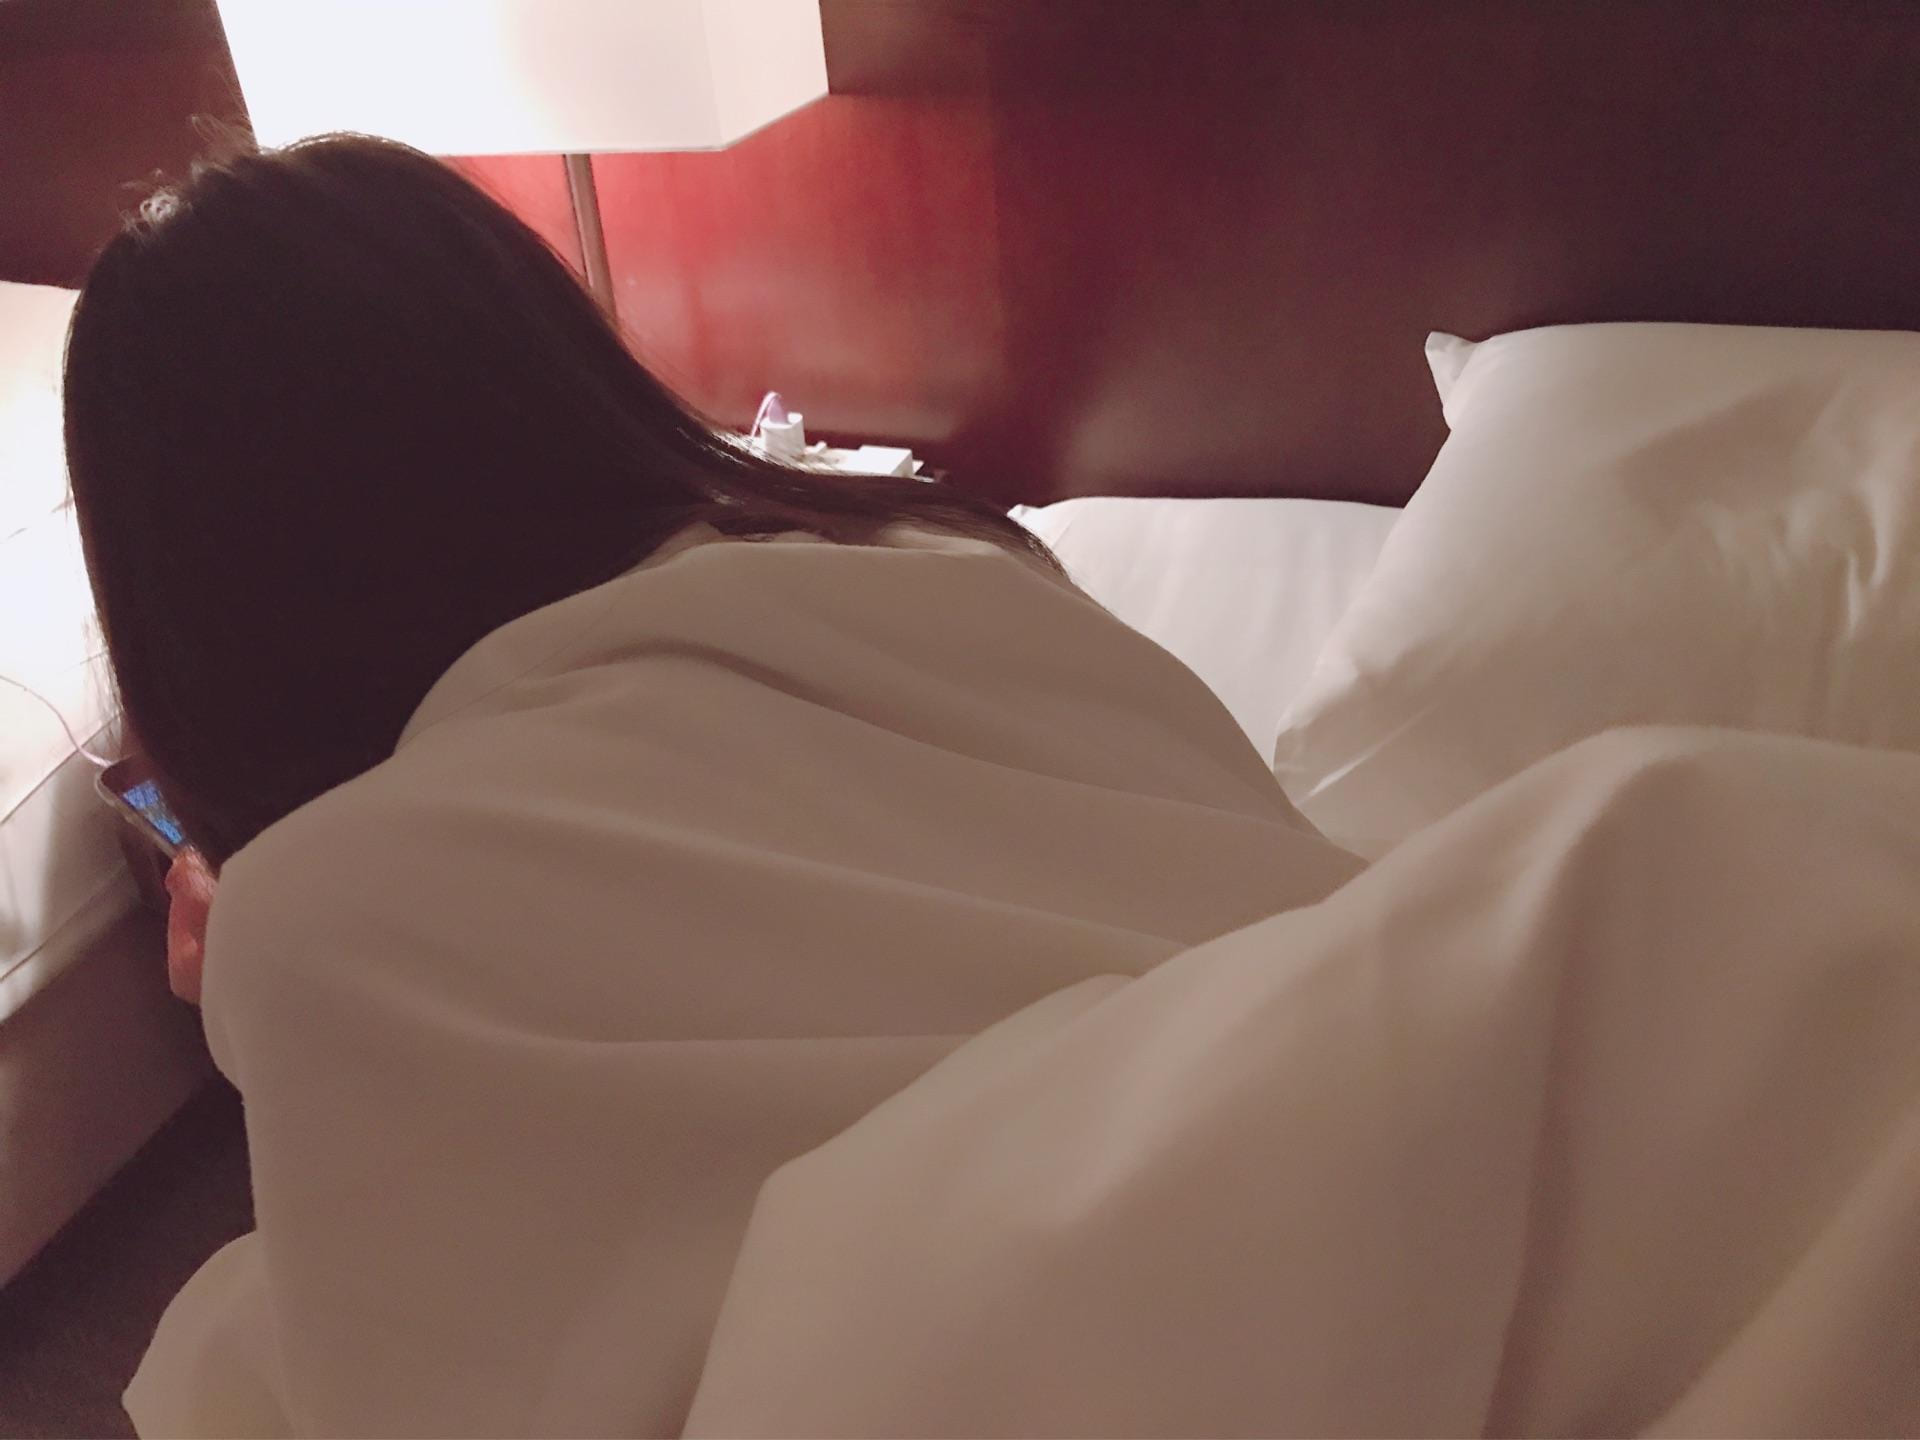 【SKE山内鈴蘭】トシヲ187.3【島田晴香和泉萌咲怜音華怜美宥】 [無断転載禁止]©2ch.netYouTube動画>35本 ->画像>1500枚